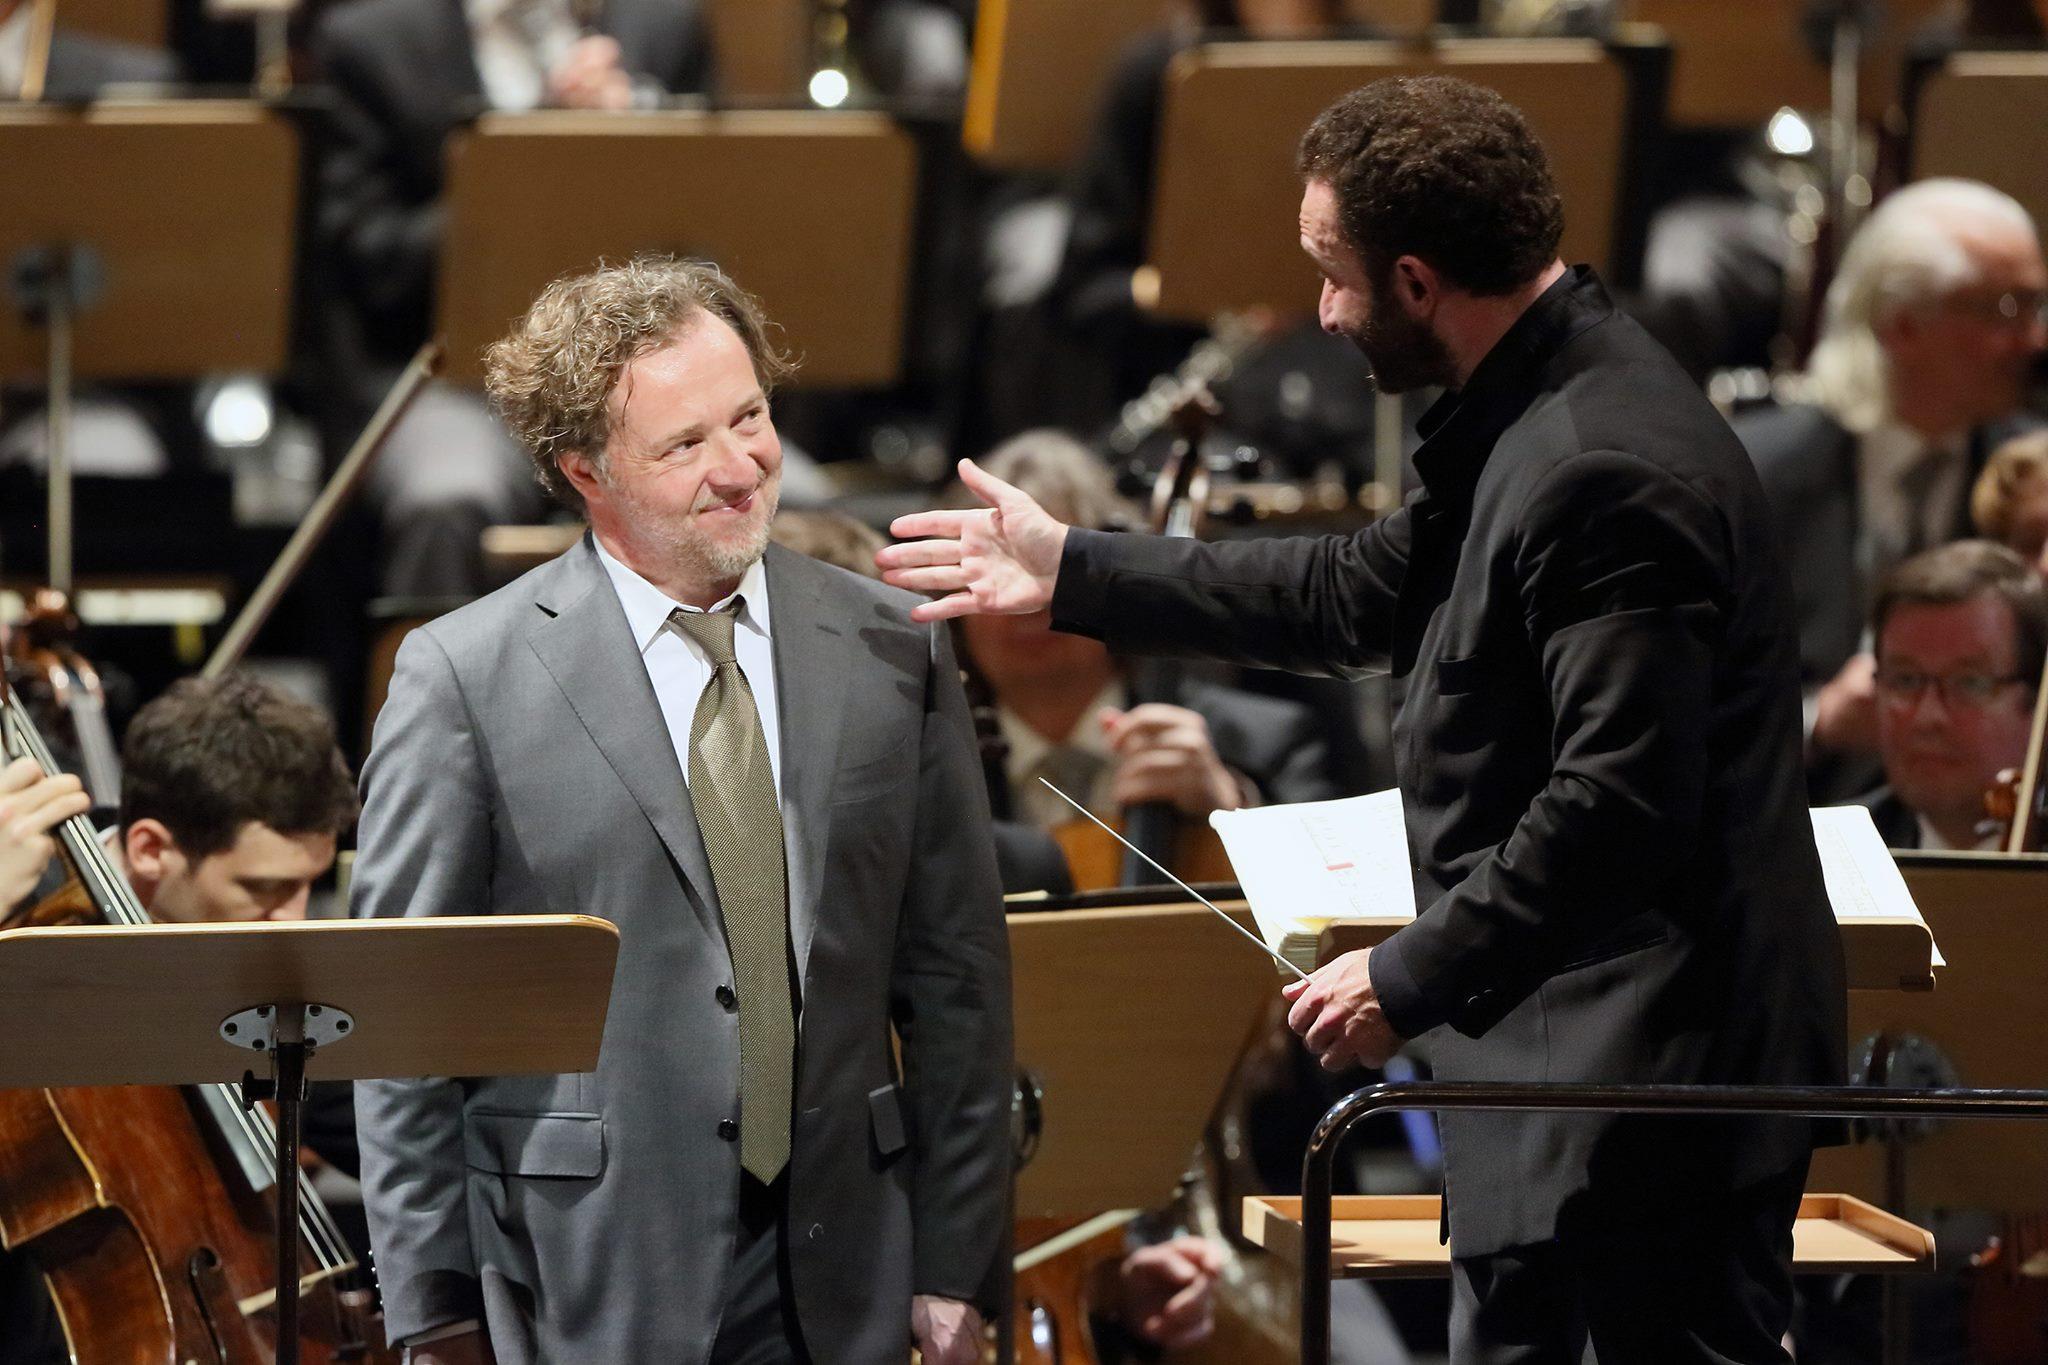 Concerts à Munich en 2015 : agenda musical et impressions 3